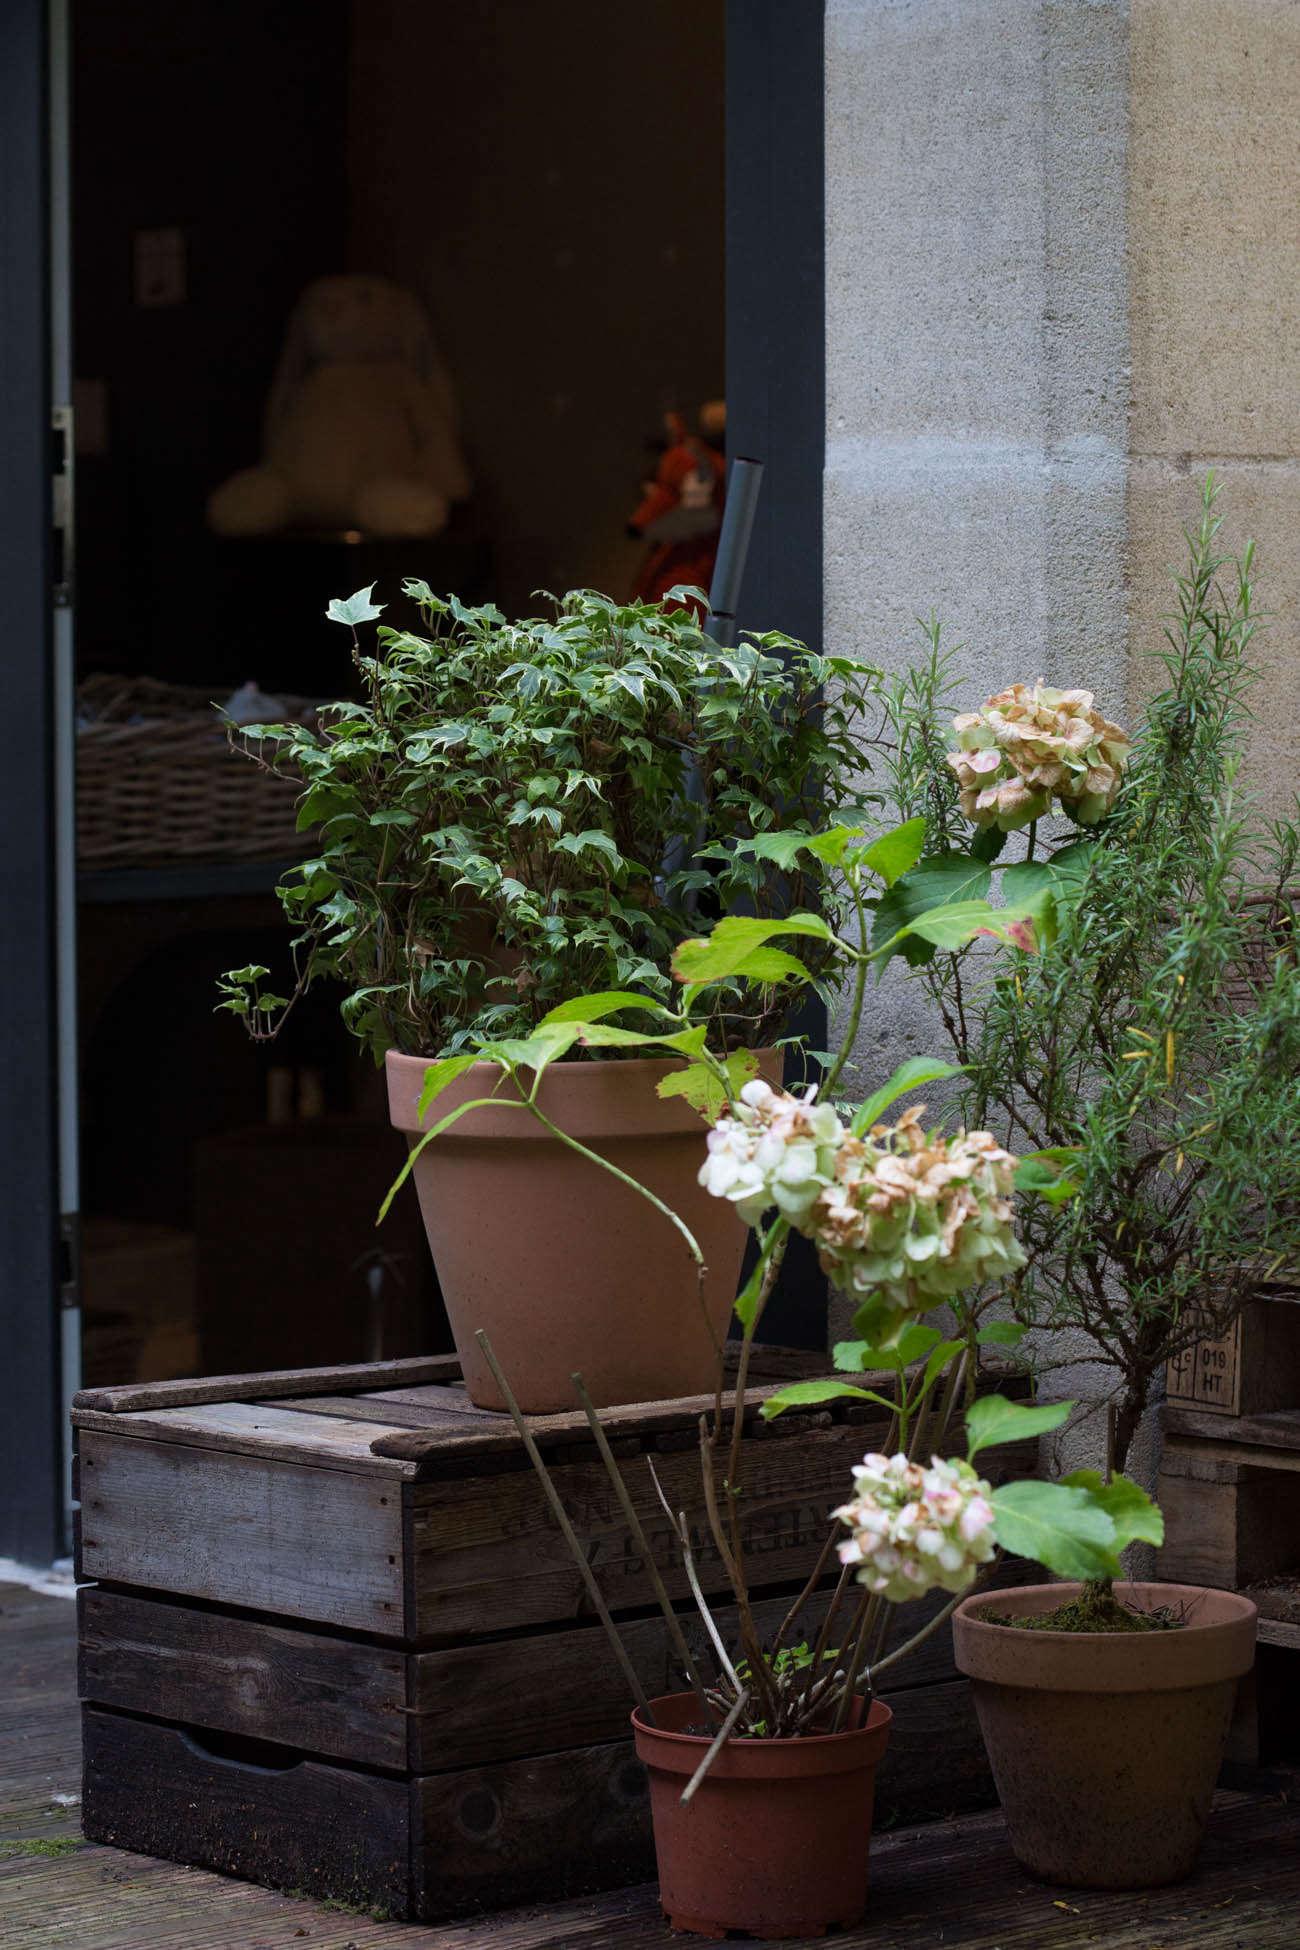 Ambre-store-france-mimi-giboin-gardenista-040